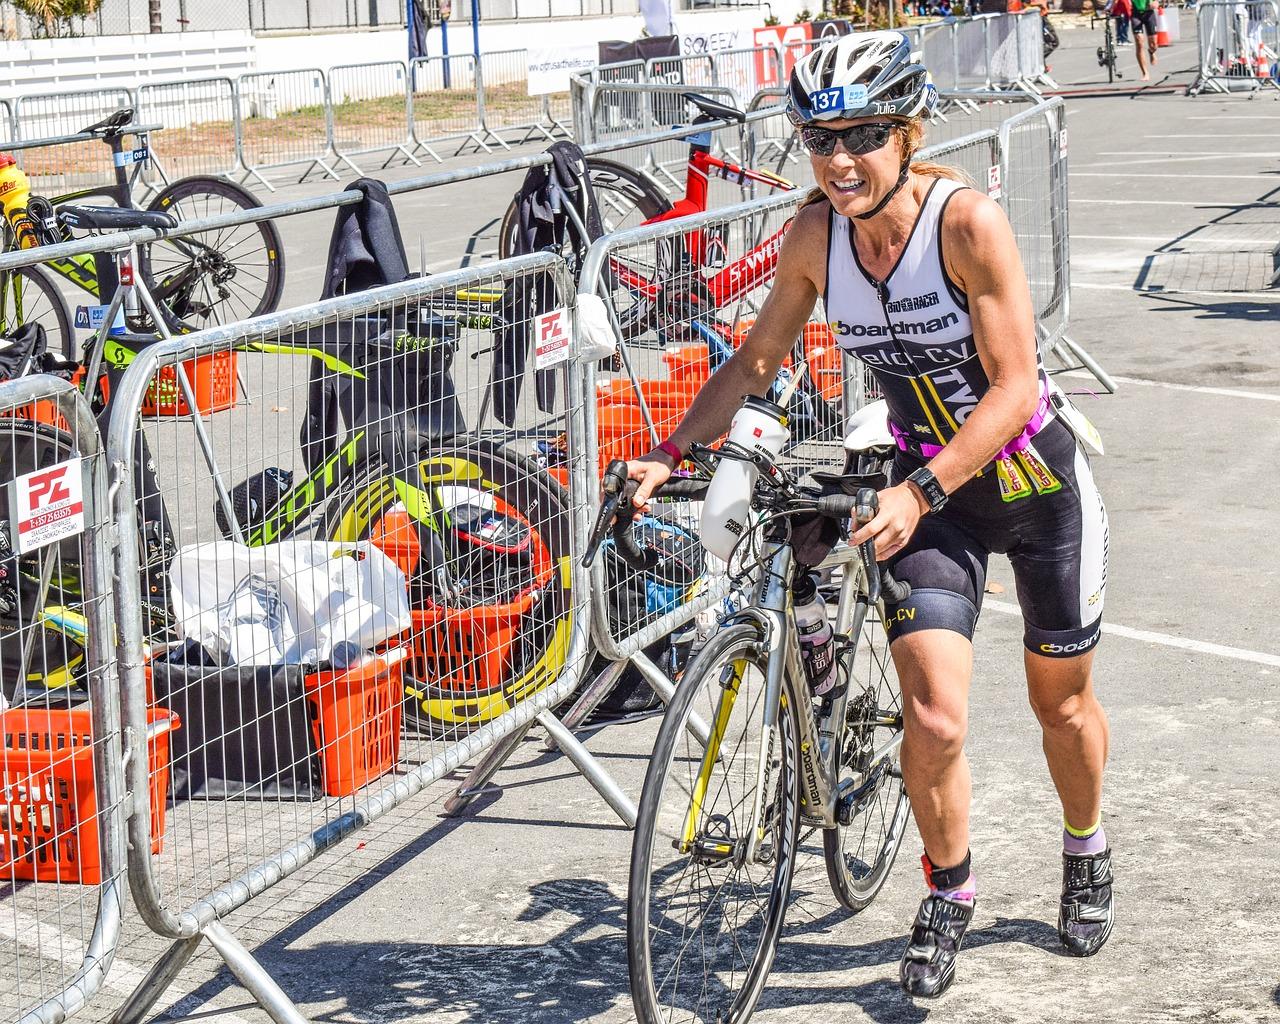 triathlon-2176343_1280